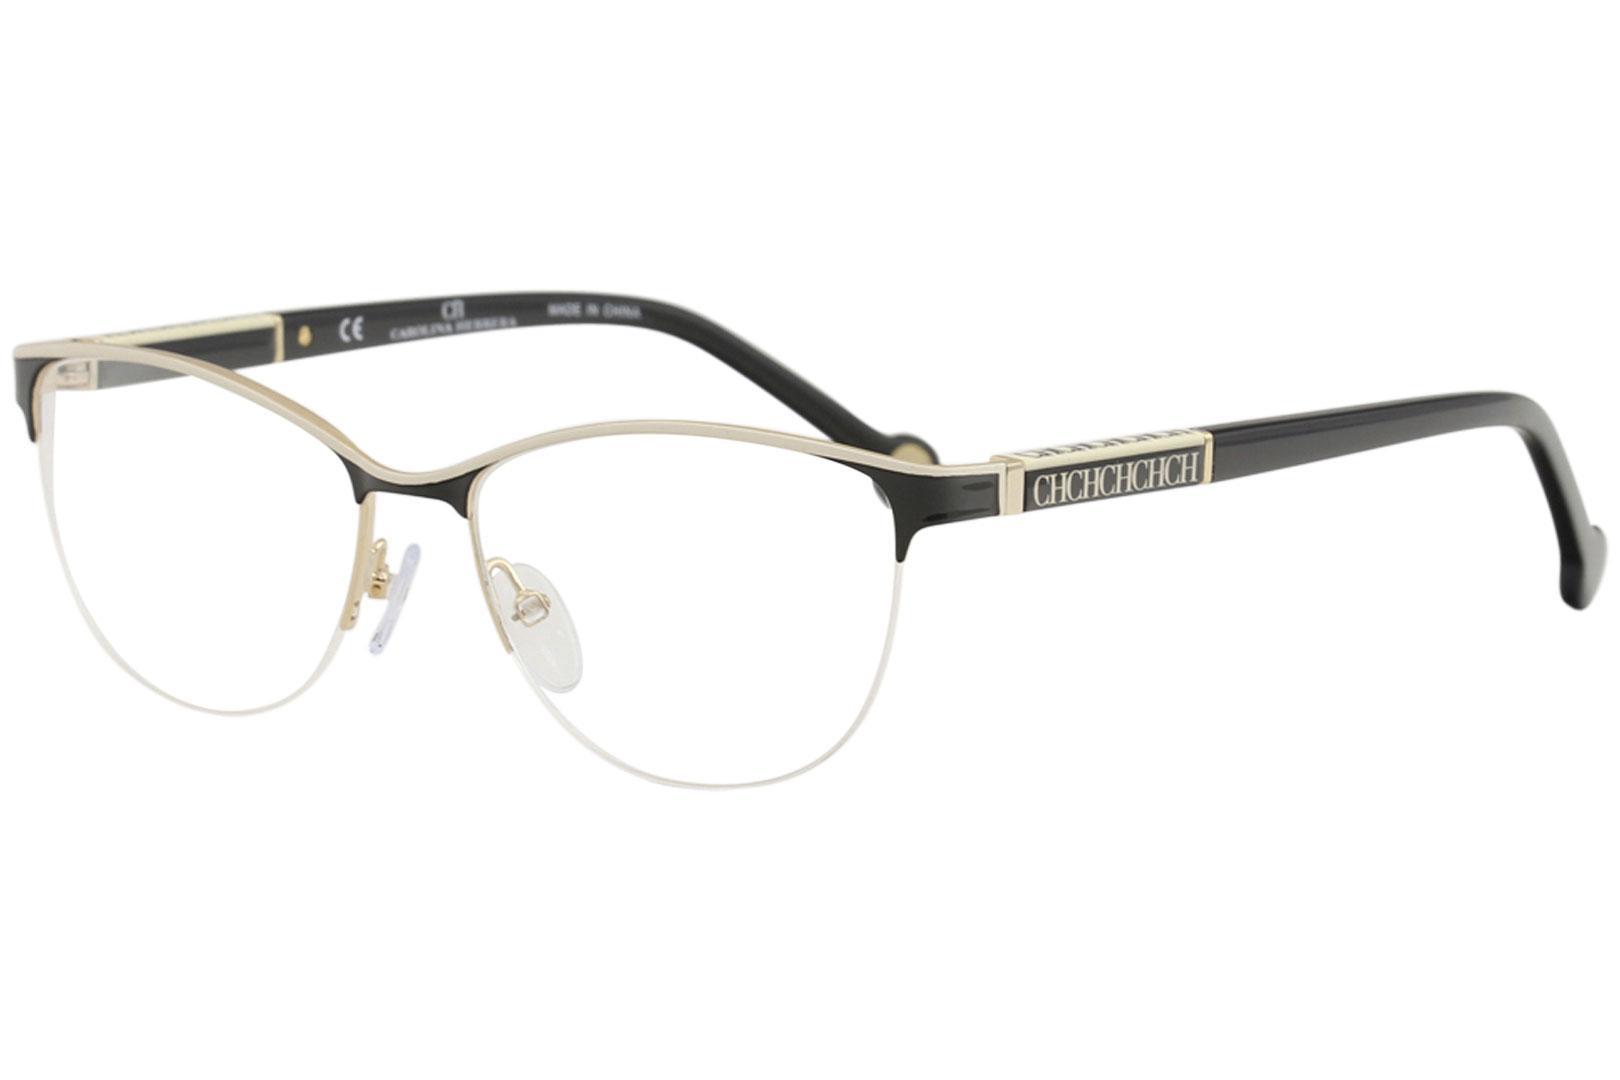 22777f8c18 CH Carolina Herrera Women s Eyeglasses VHE079K VHE 079 K Half Rim Optical  Frame by Carolina Herrera. Touch to zoom